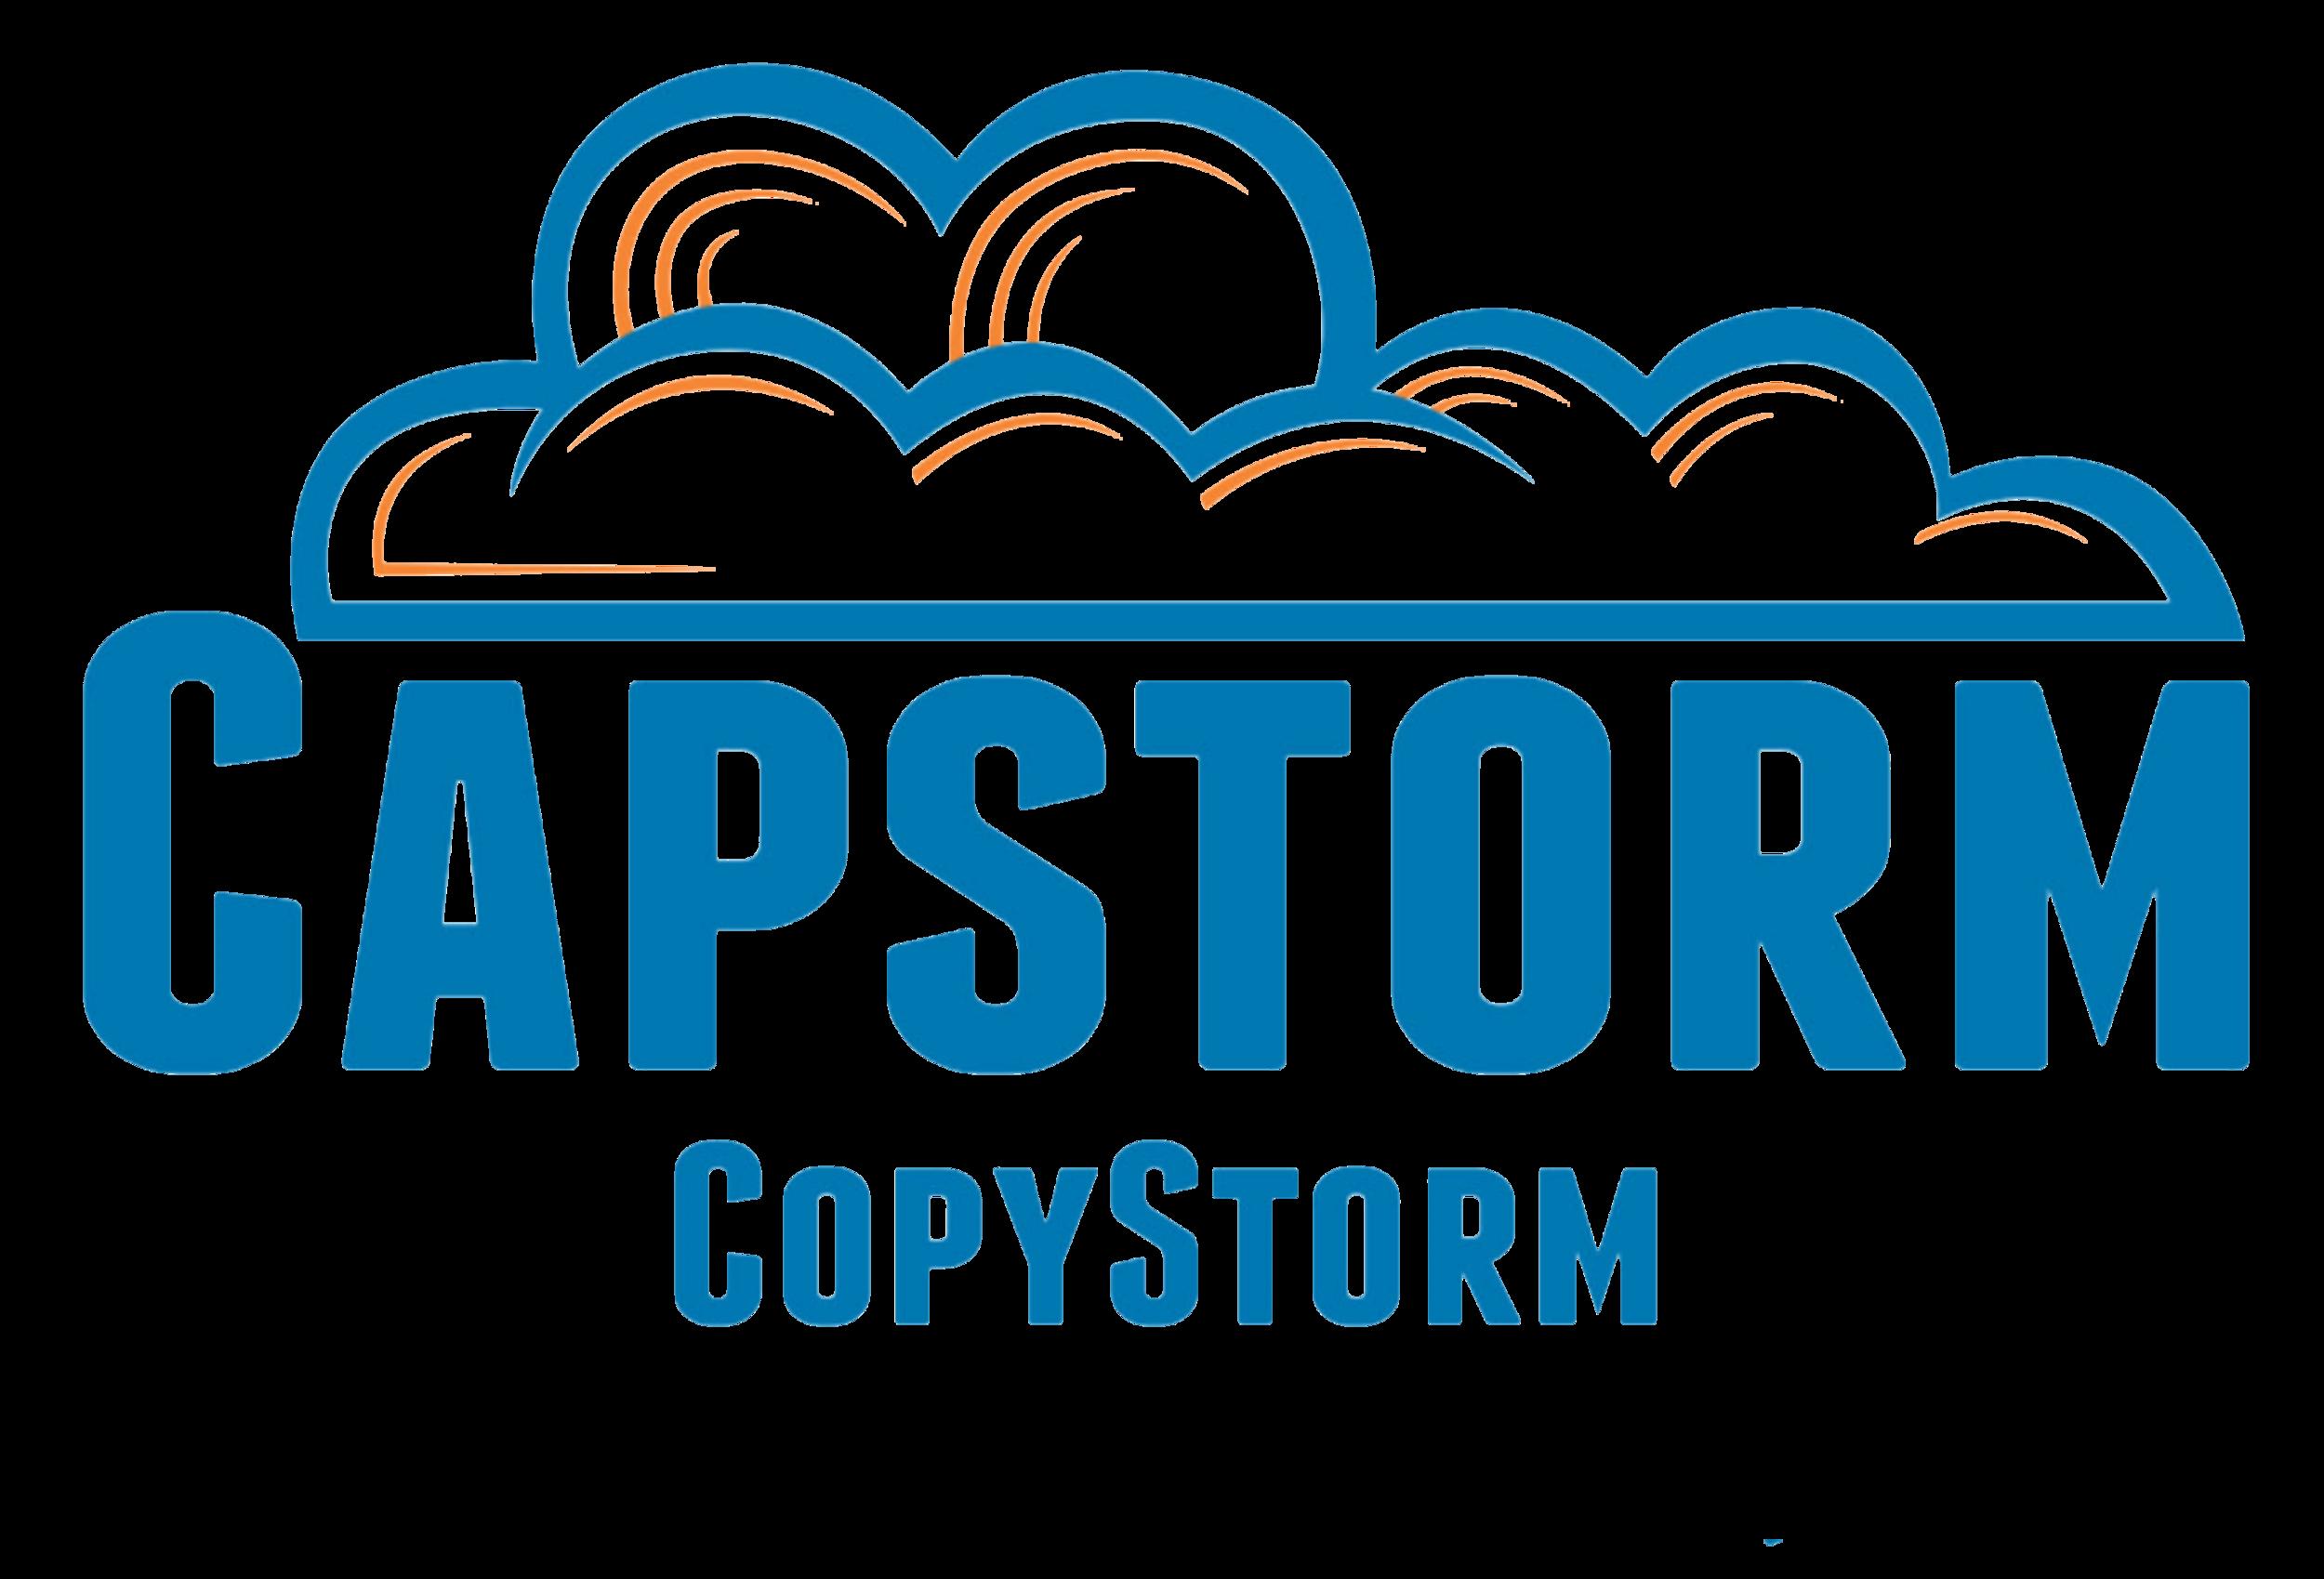 CapstormLogo.png